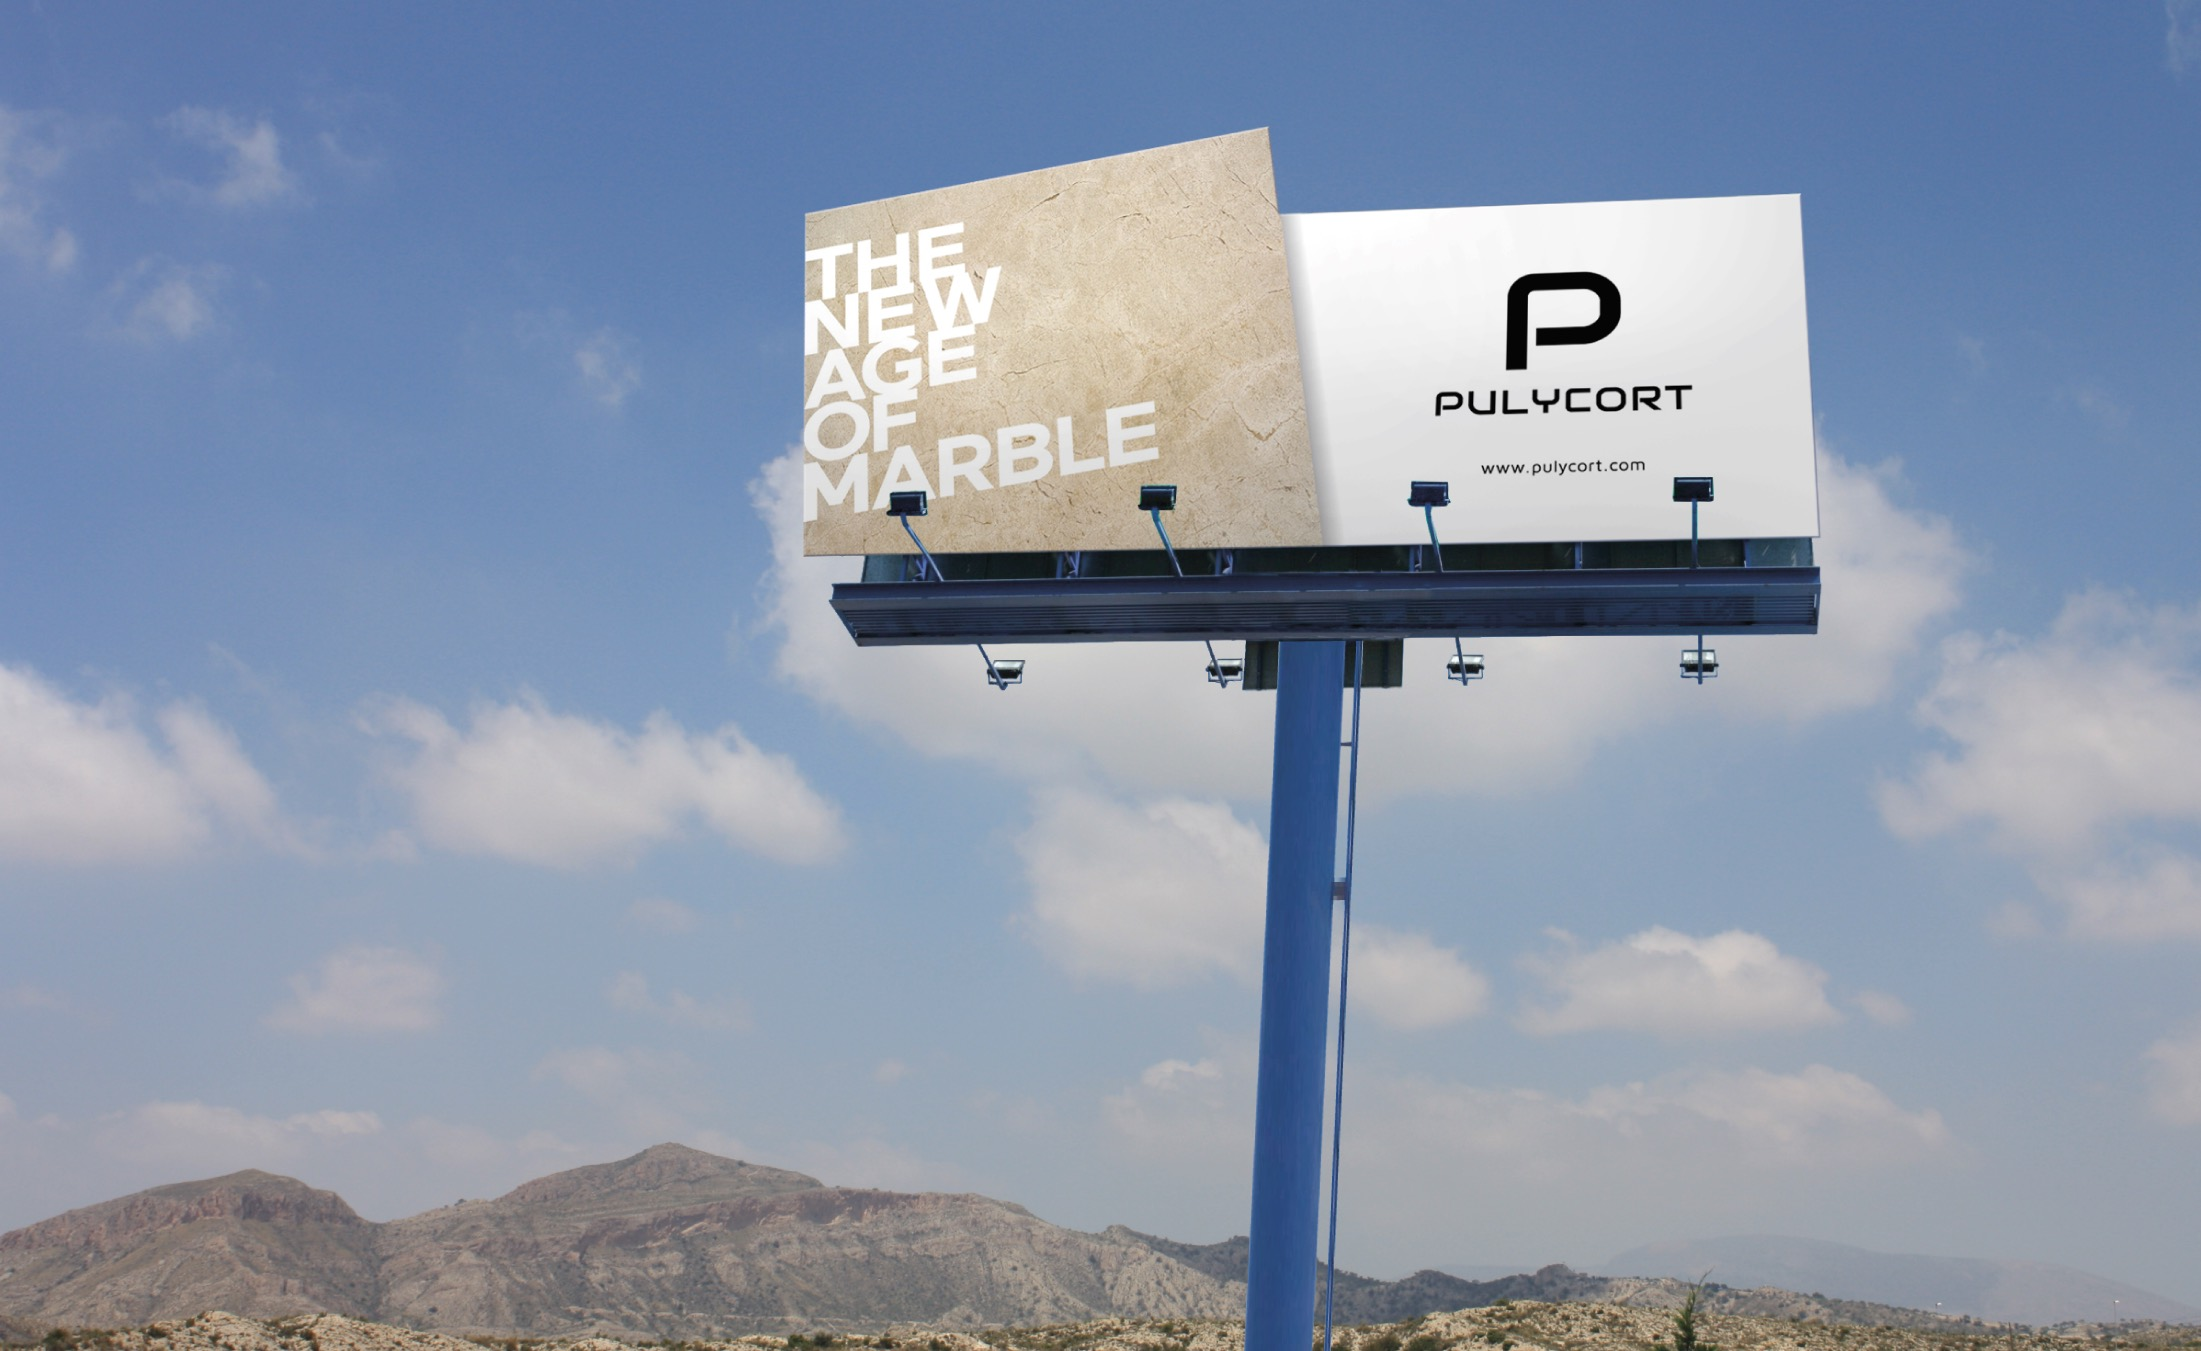 Pulycort billboard